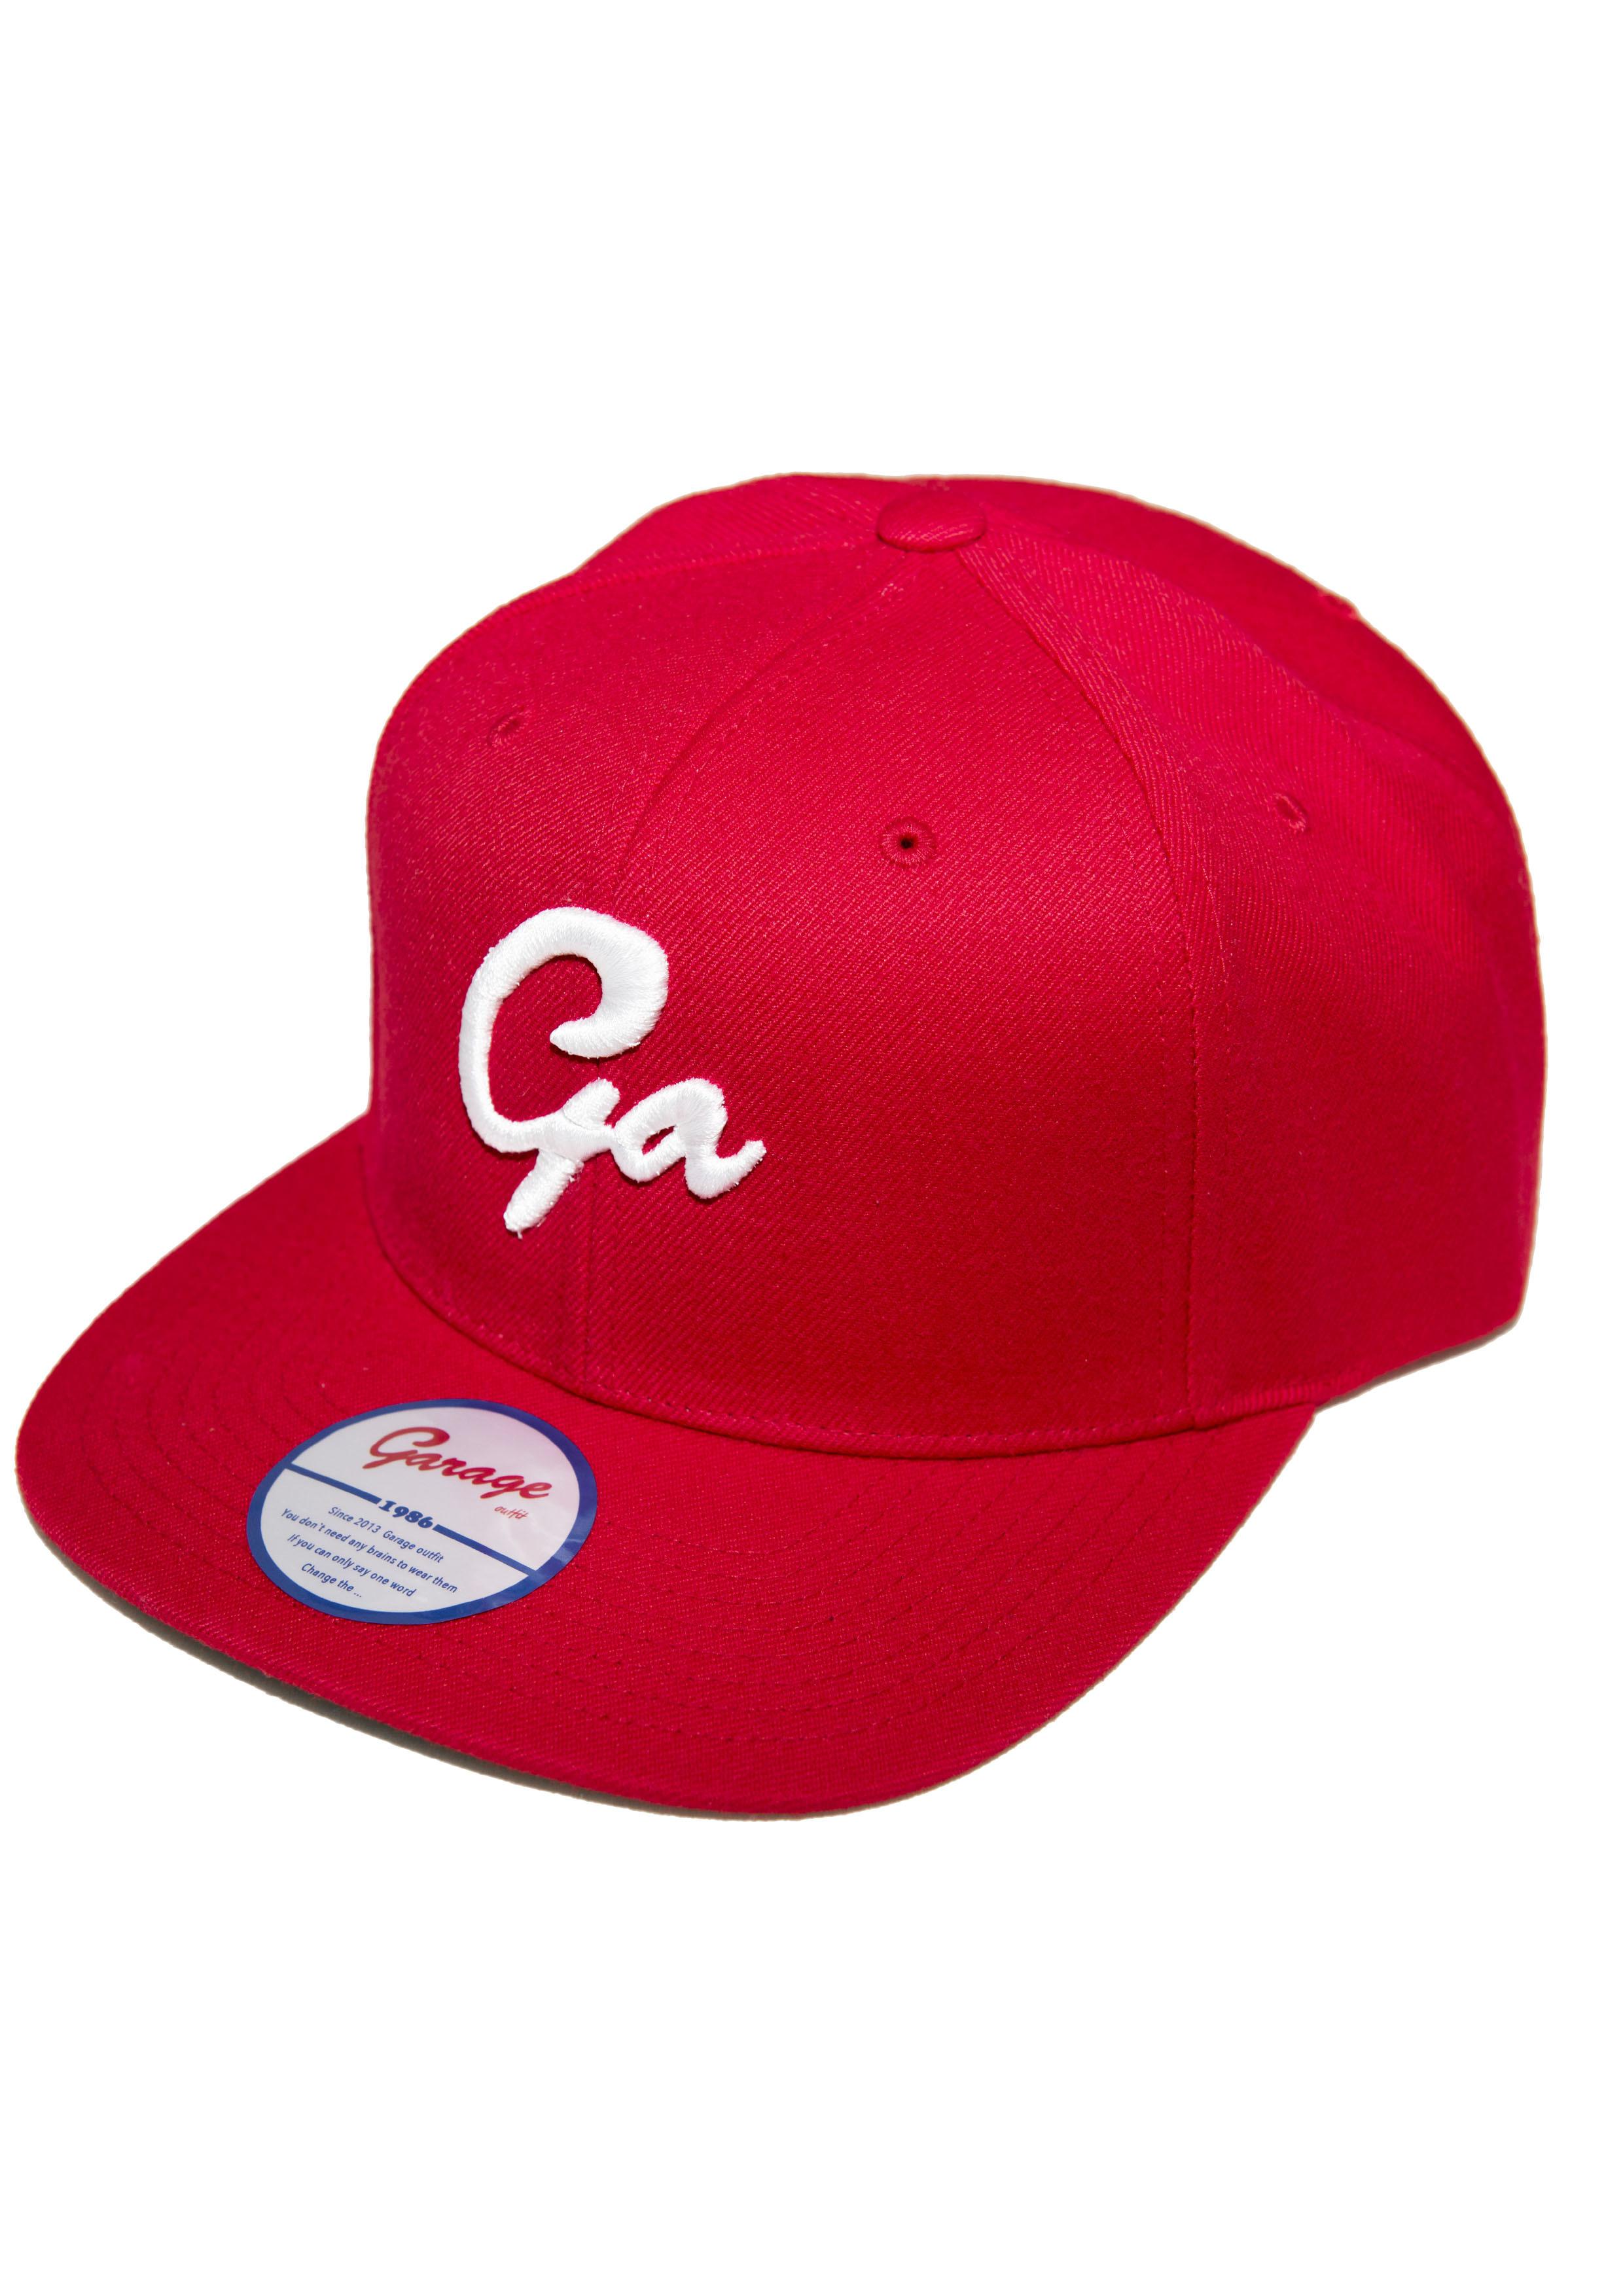 Ga cap Red